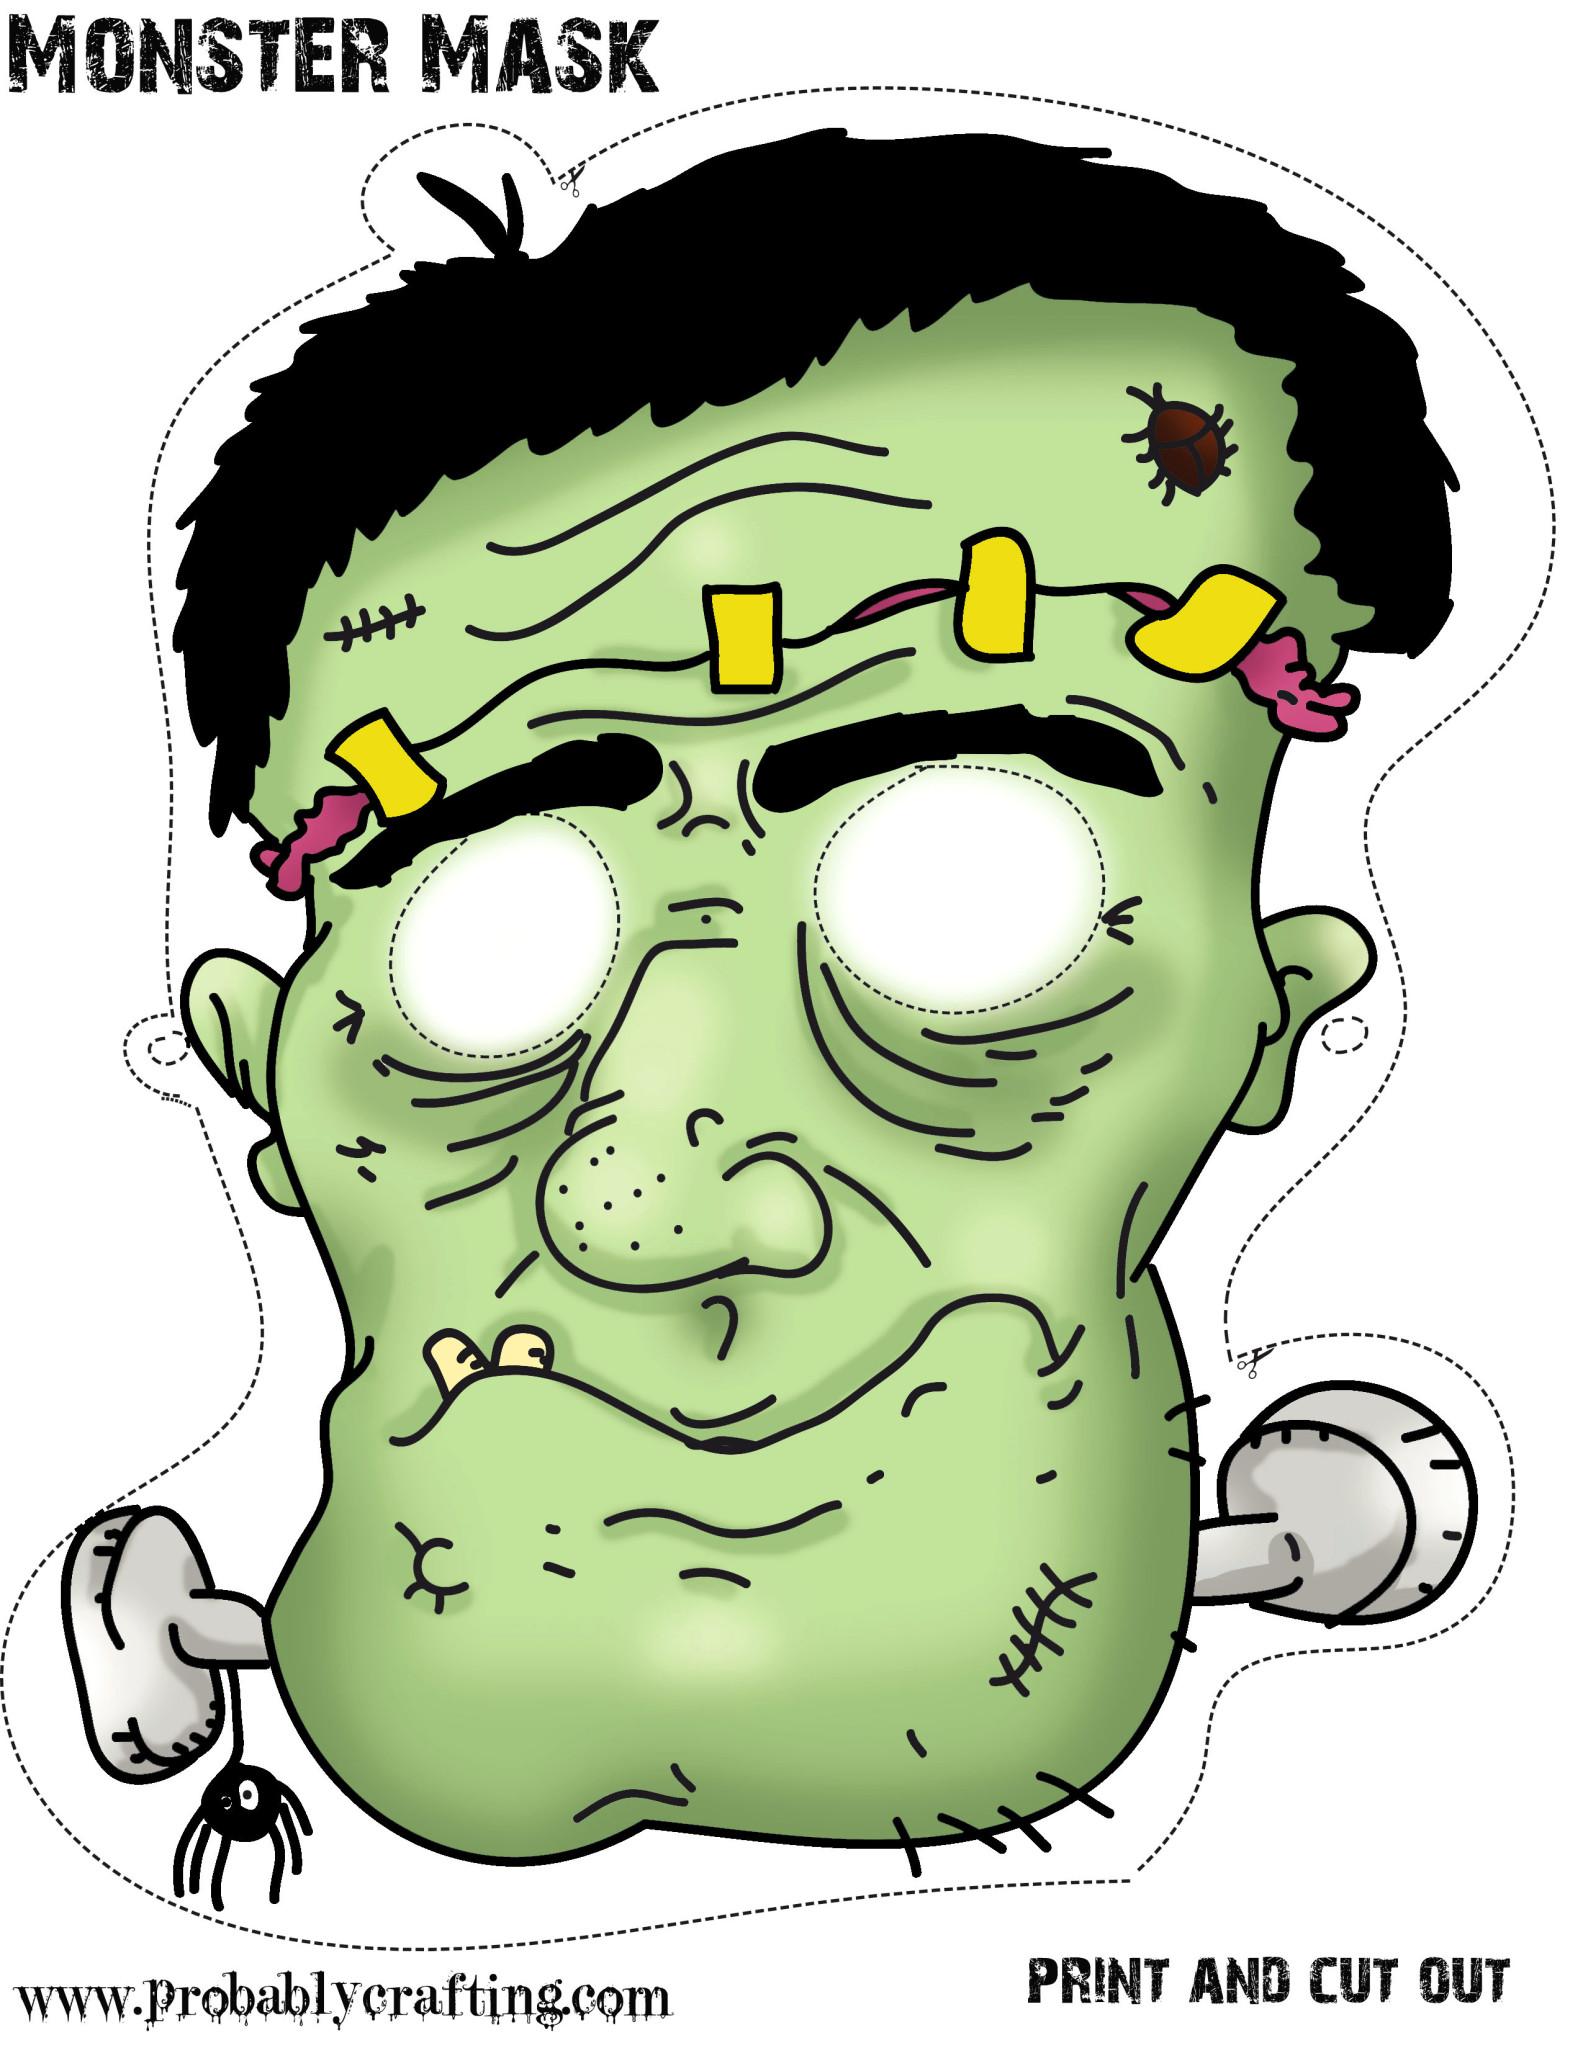 Free Printable Halloween Monster Mask Miniature Masterminds